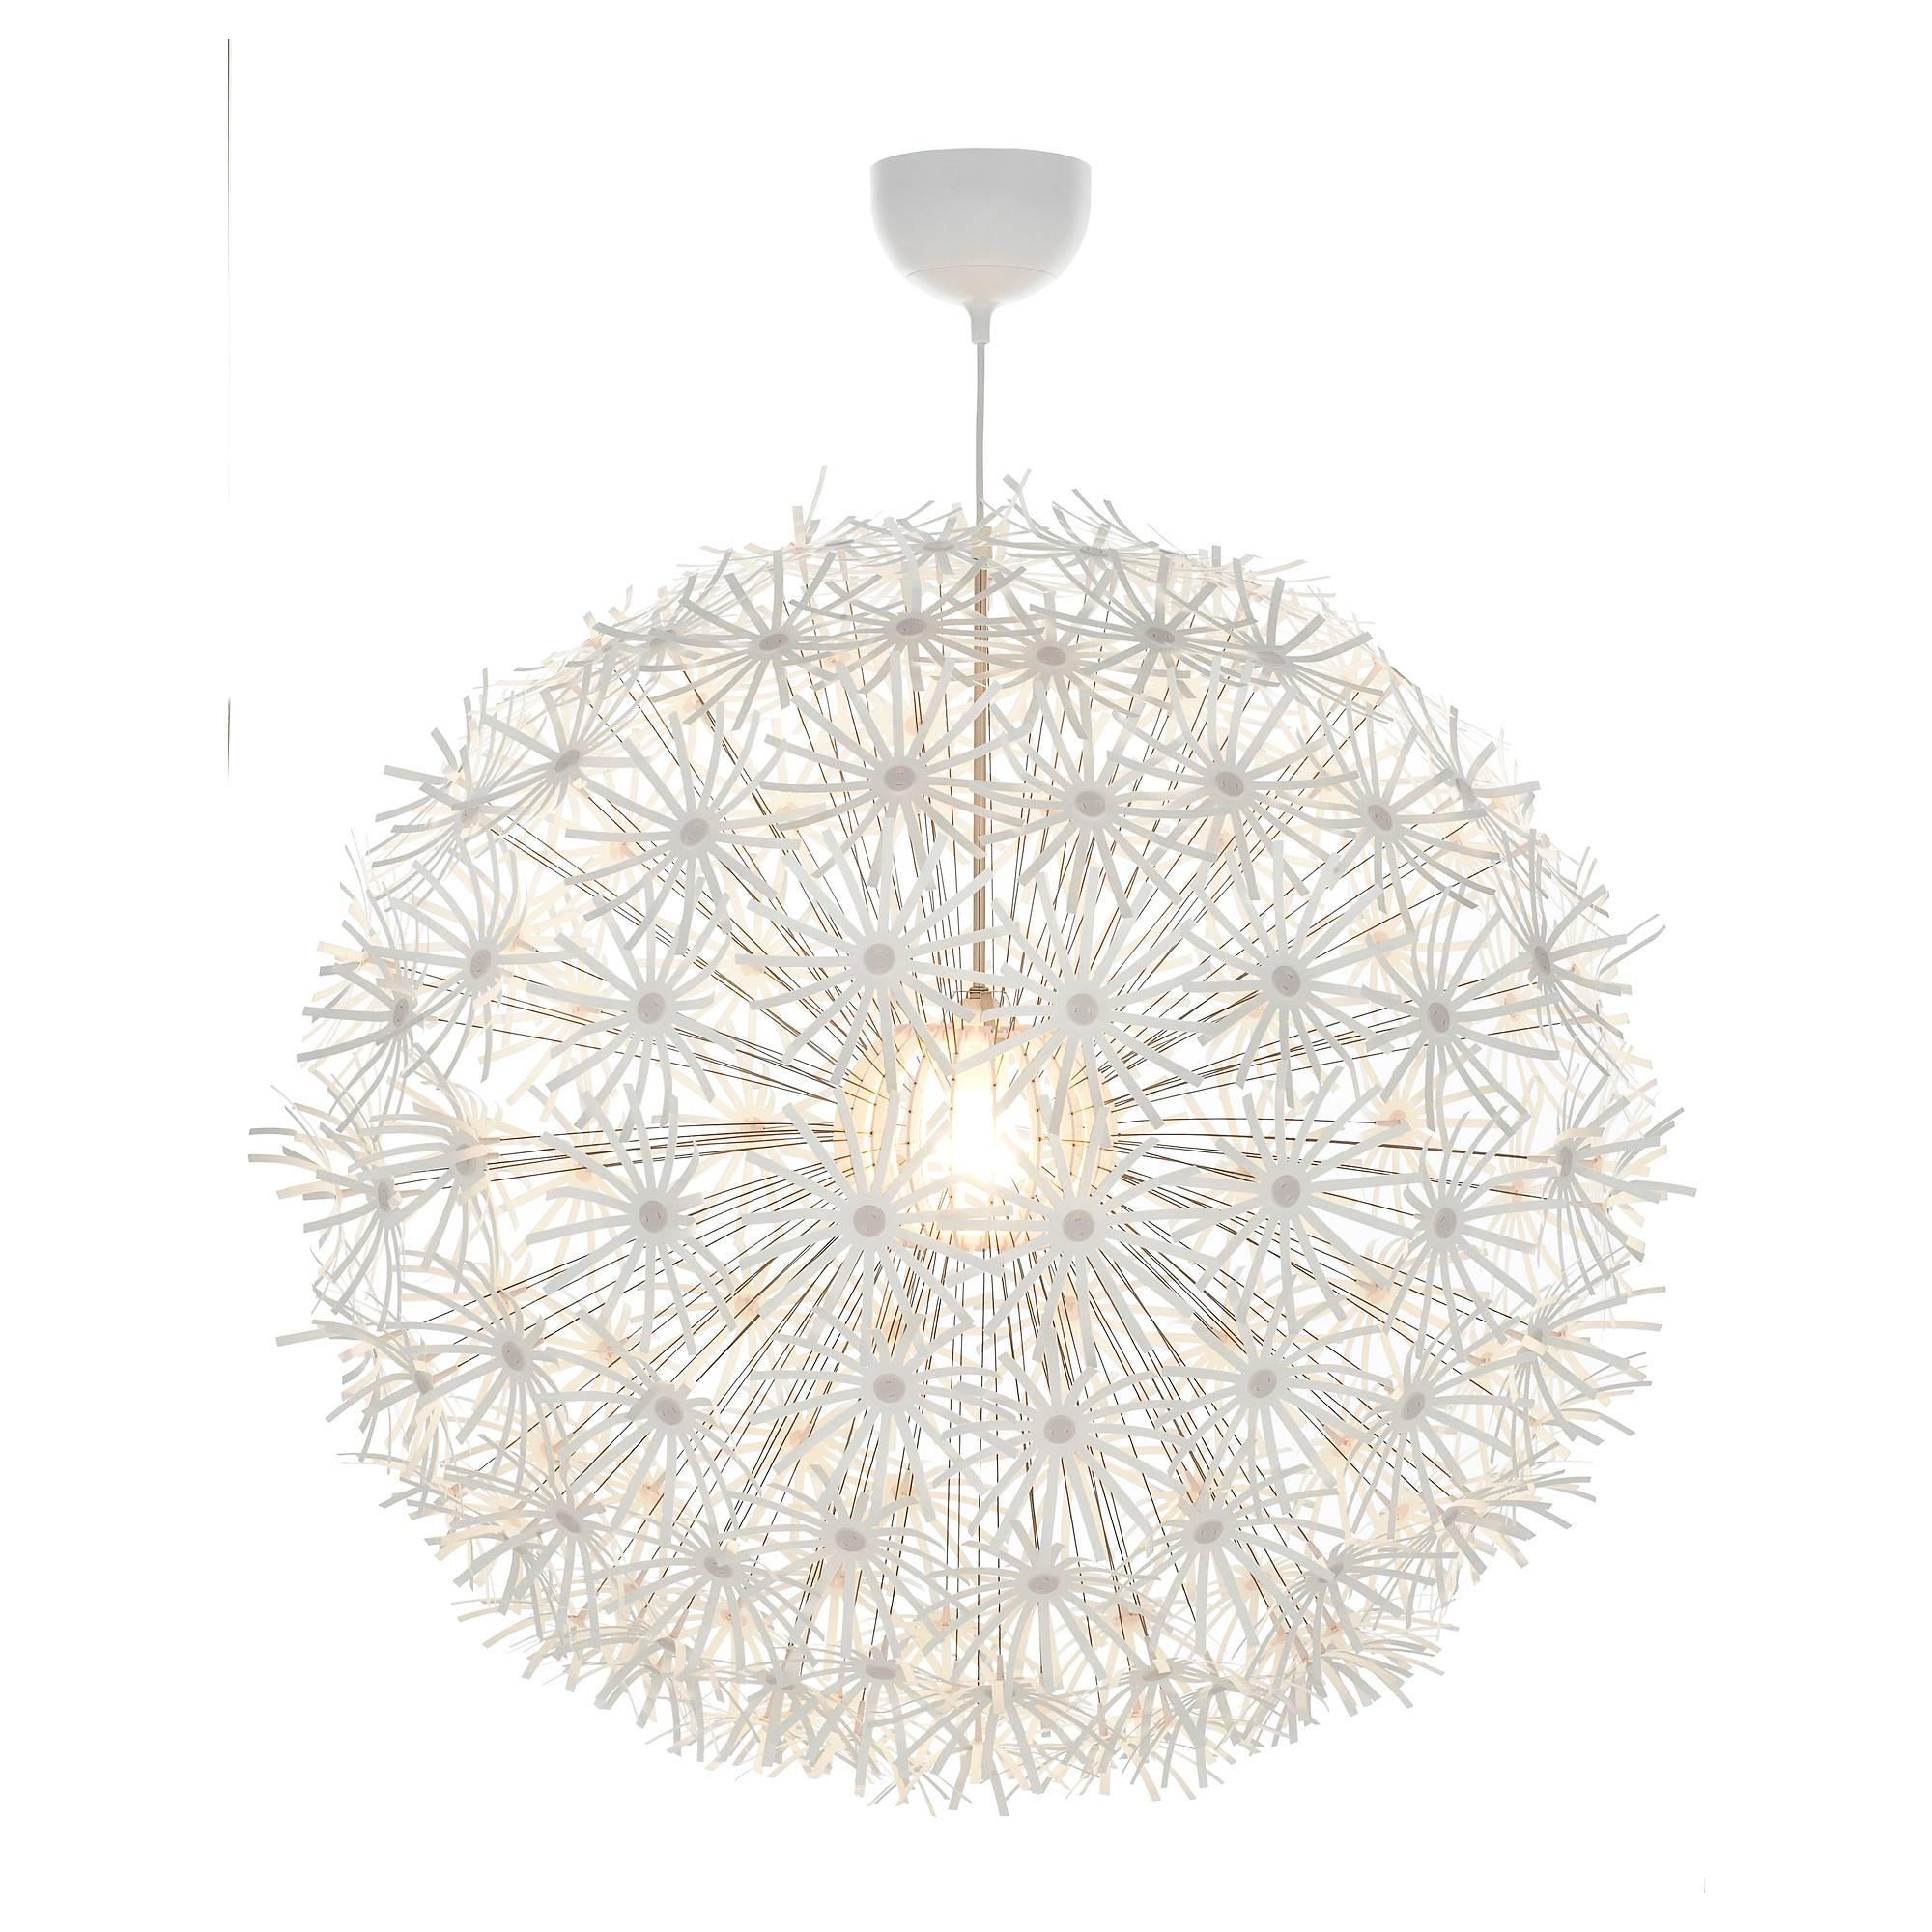 Ikea Ps Maskros Pendant Lamp – Ikea Pertaining To Ikea Pendant Lights Fixtures (View 13 of 15)